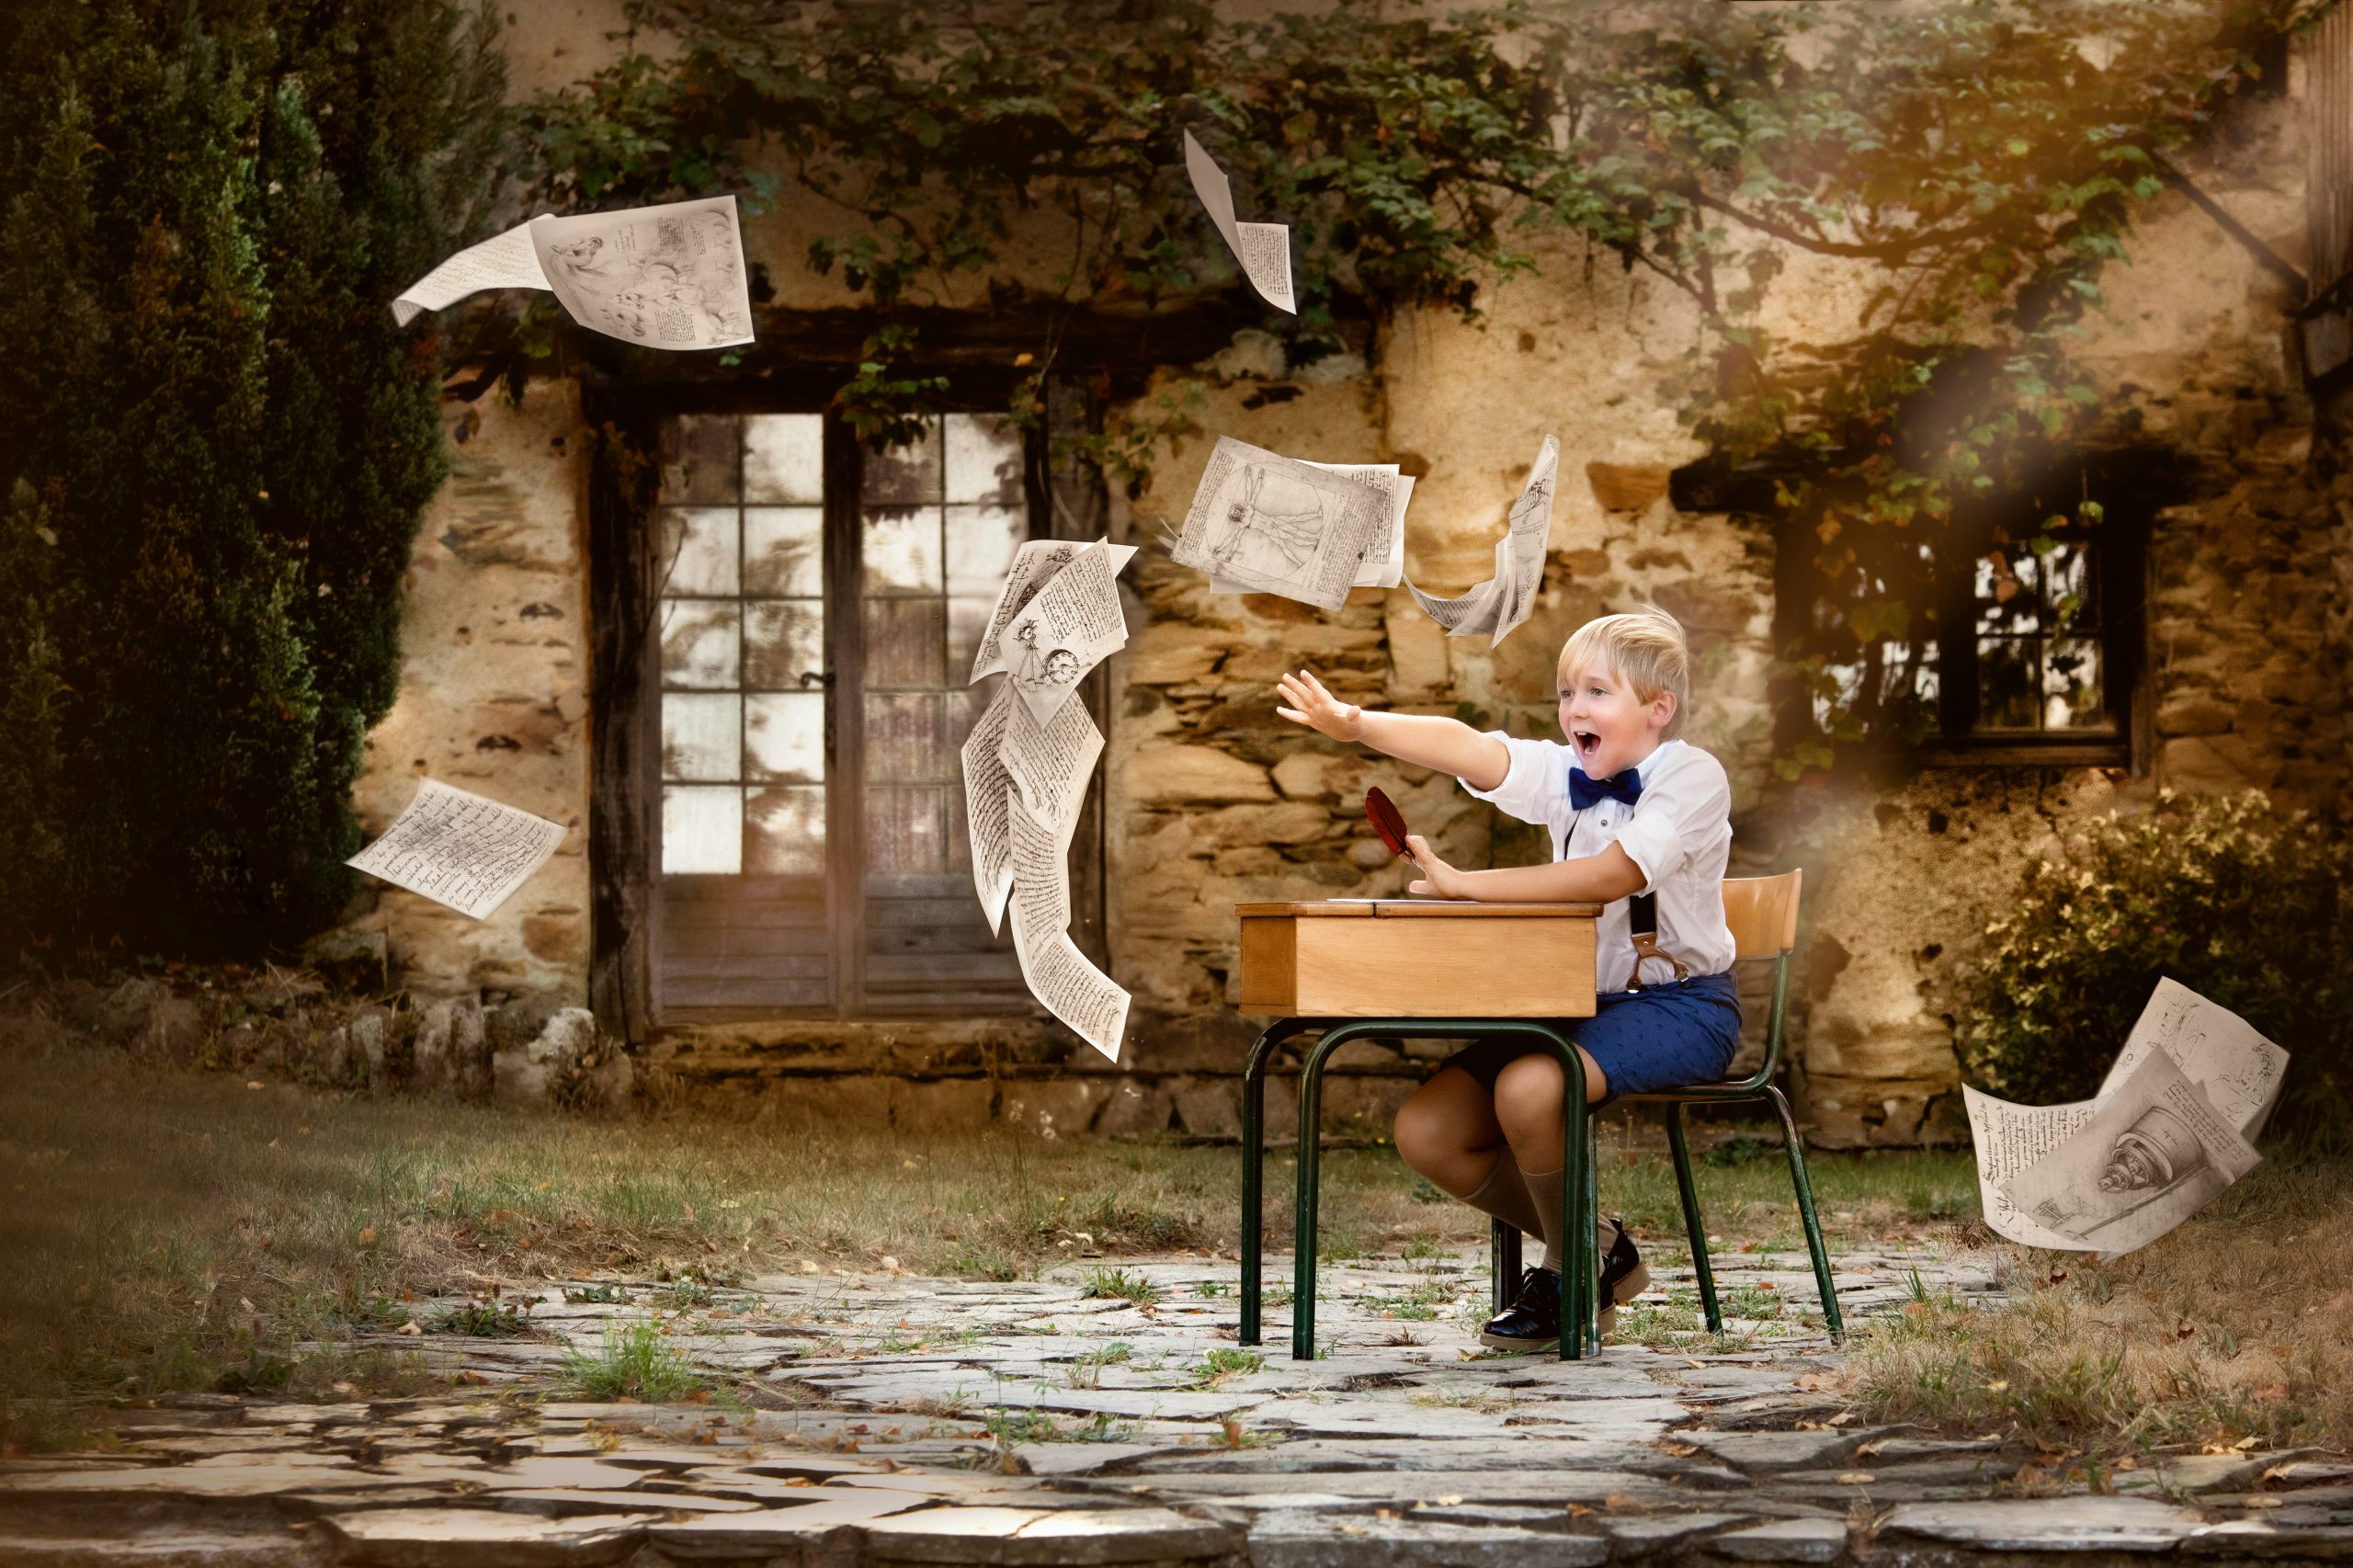 photographies d'art, artistes Aveyron, STUDIO END®